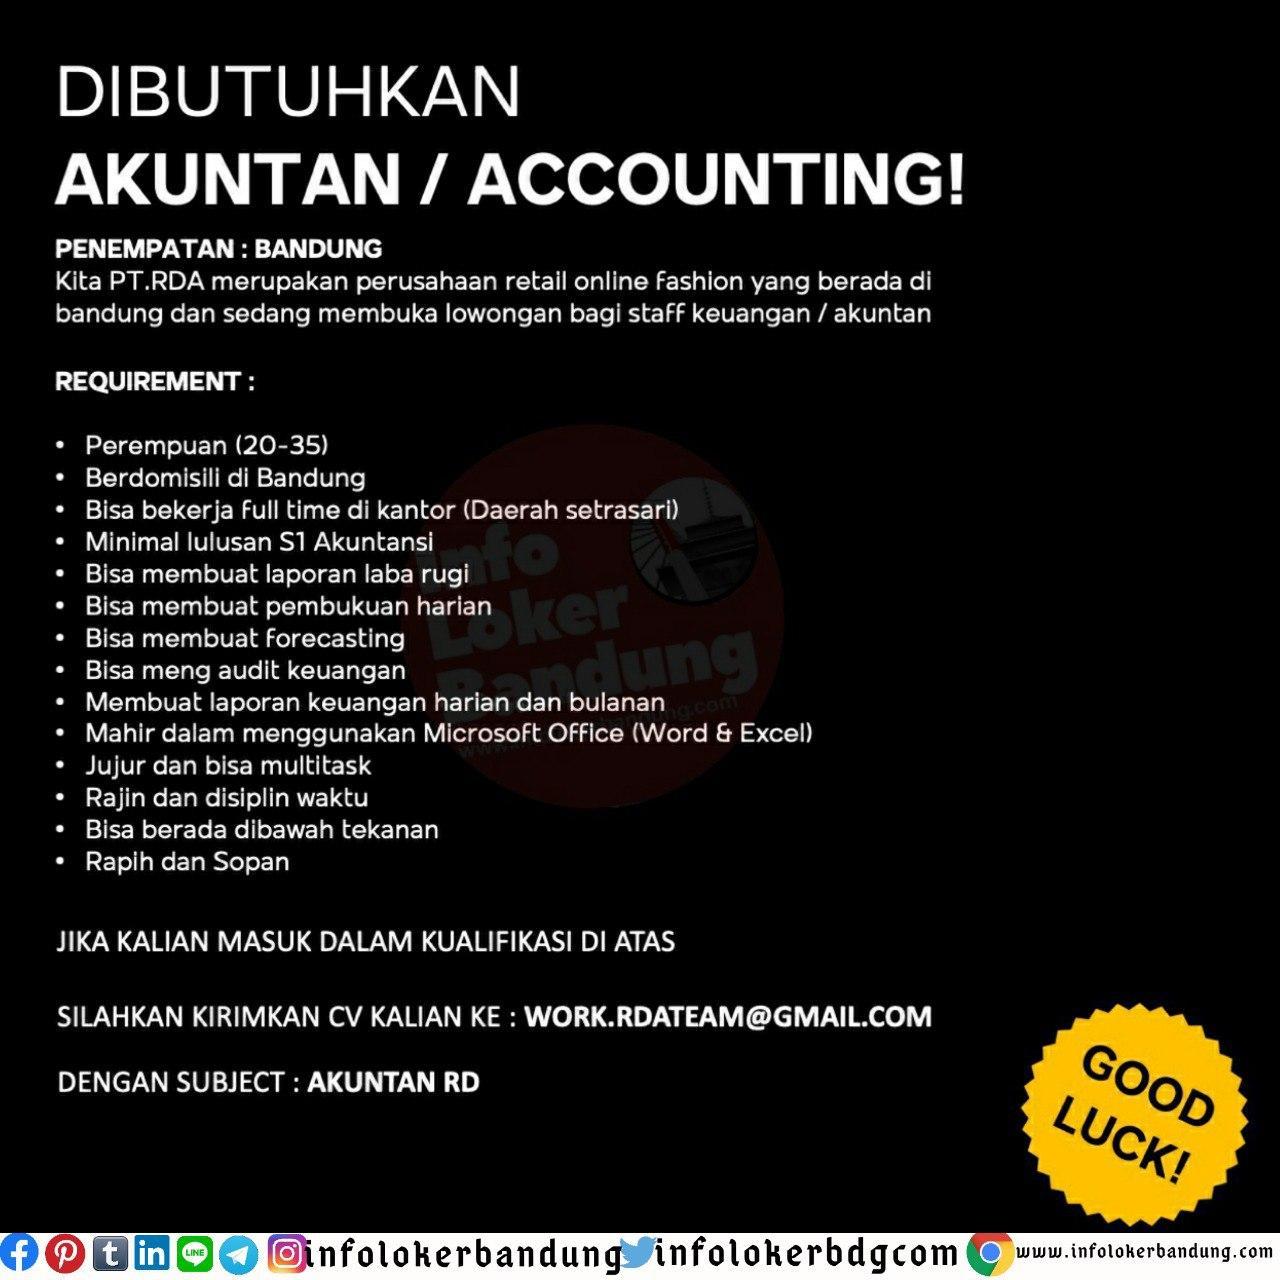 Lowongan Kerja Akuntan Accounting Pt Rda Bandung Juni 2020 Info Loker Bandung 2021